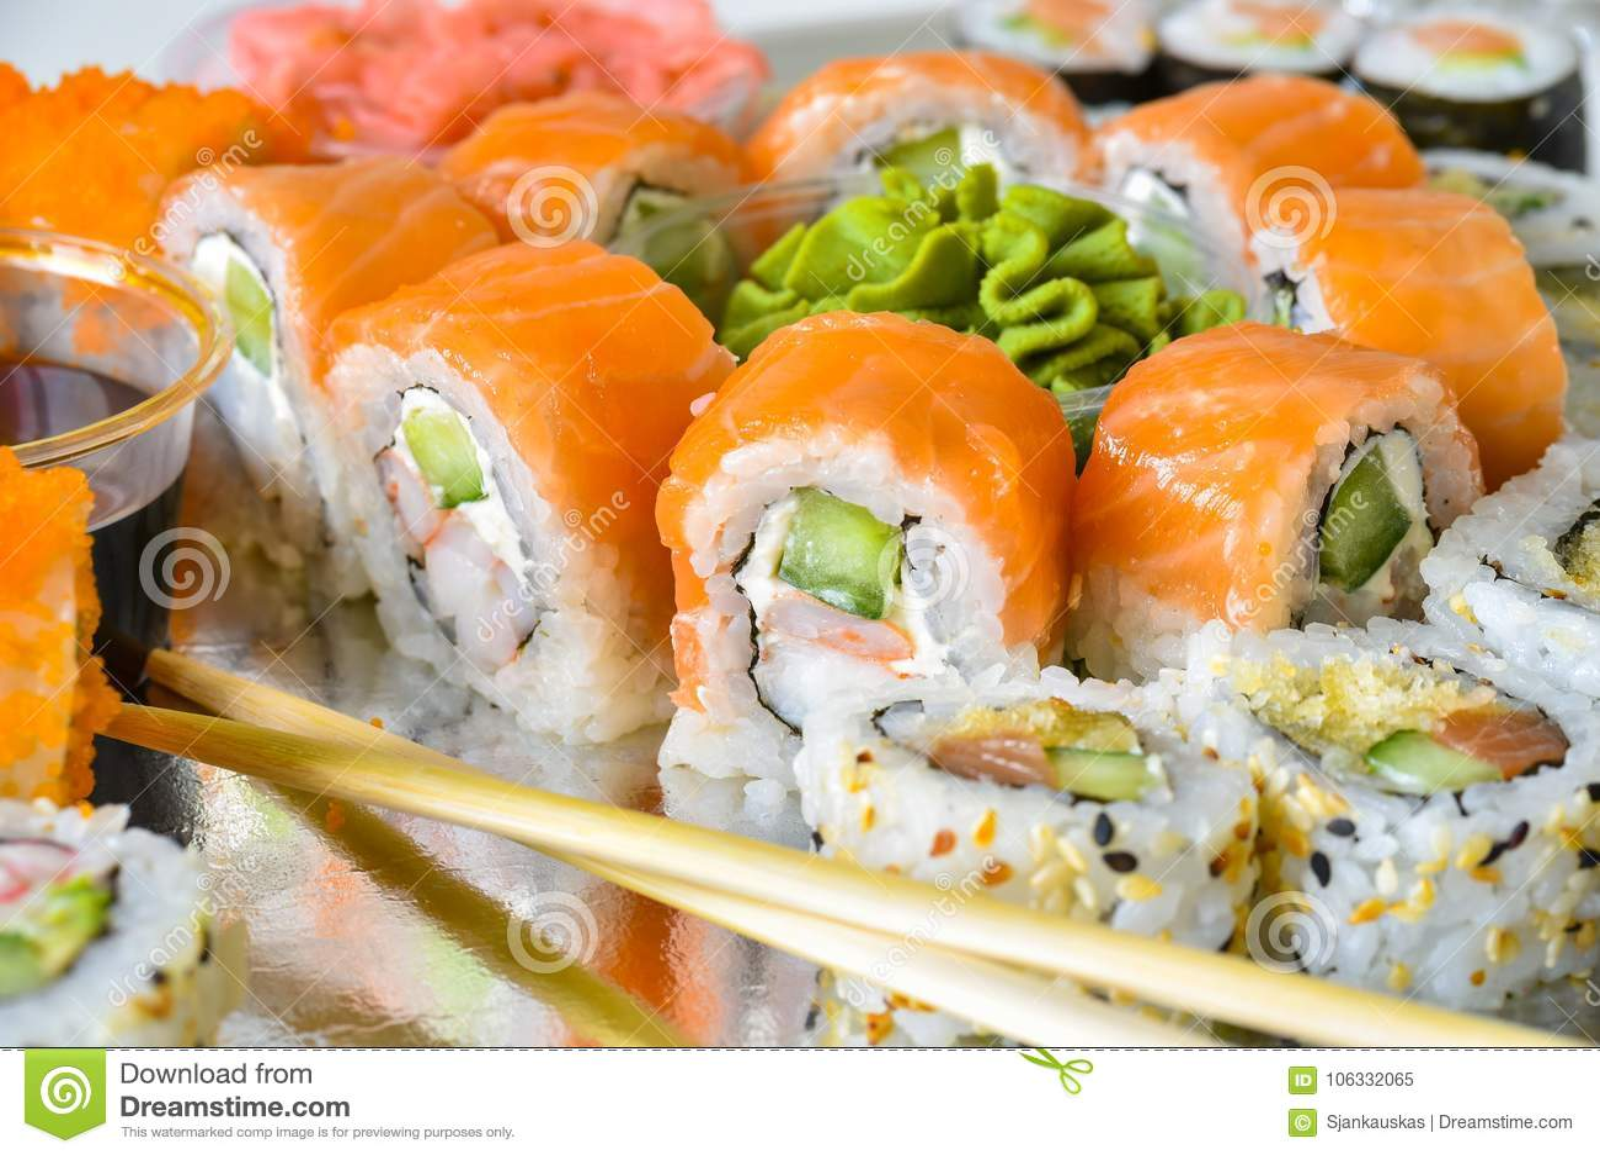 Sushi rolls platter